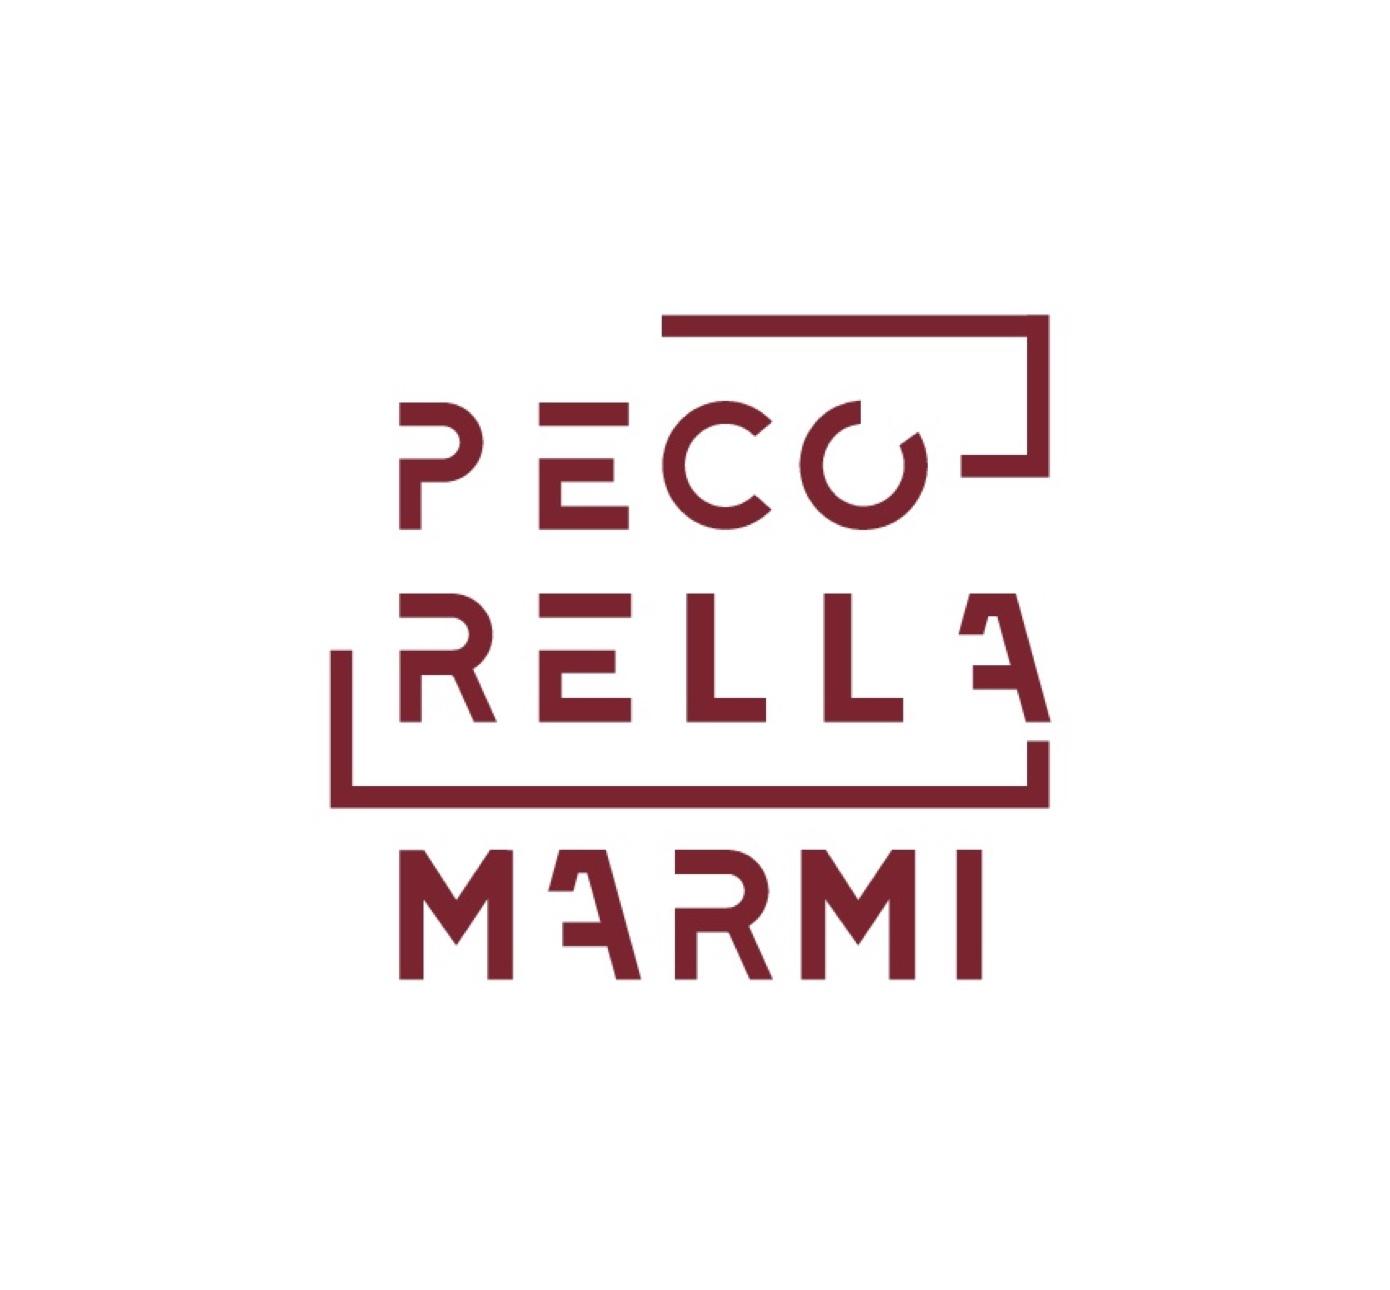 pecorella-marmi-artigiani-della-pietra-napoli-profile